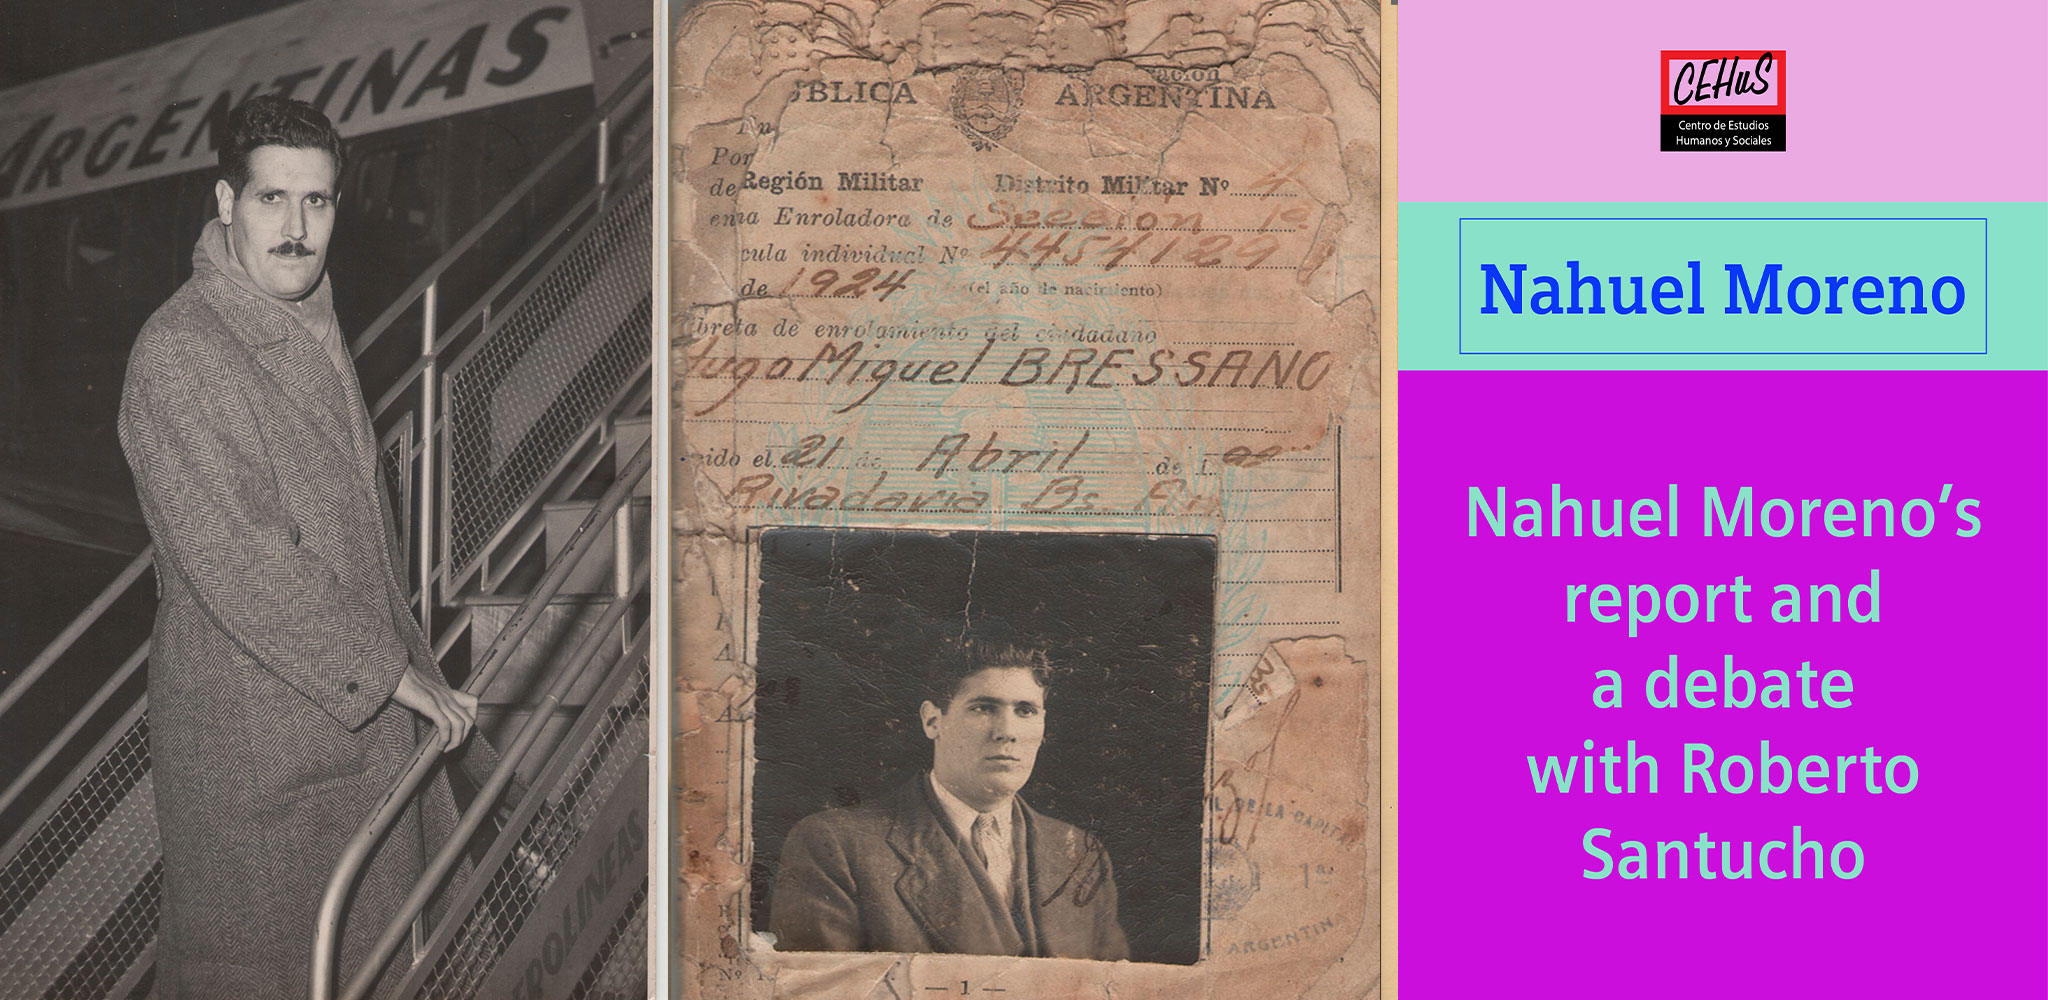 NAHUEL MORENO'S REPORT AND A DEBATE WITH ROBERTO SANTUCHO (1965)